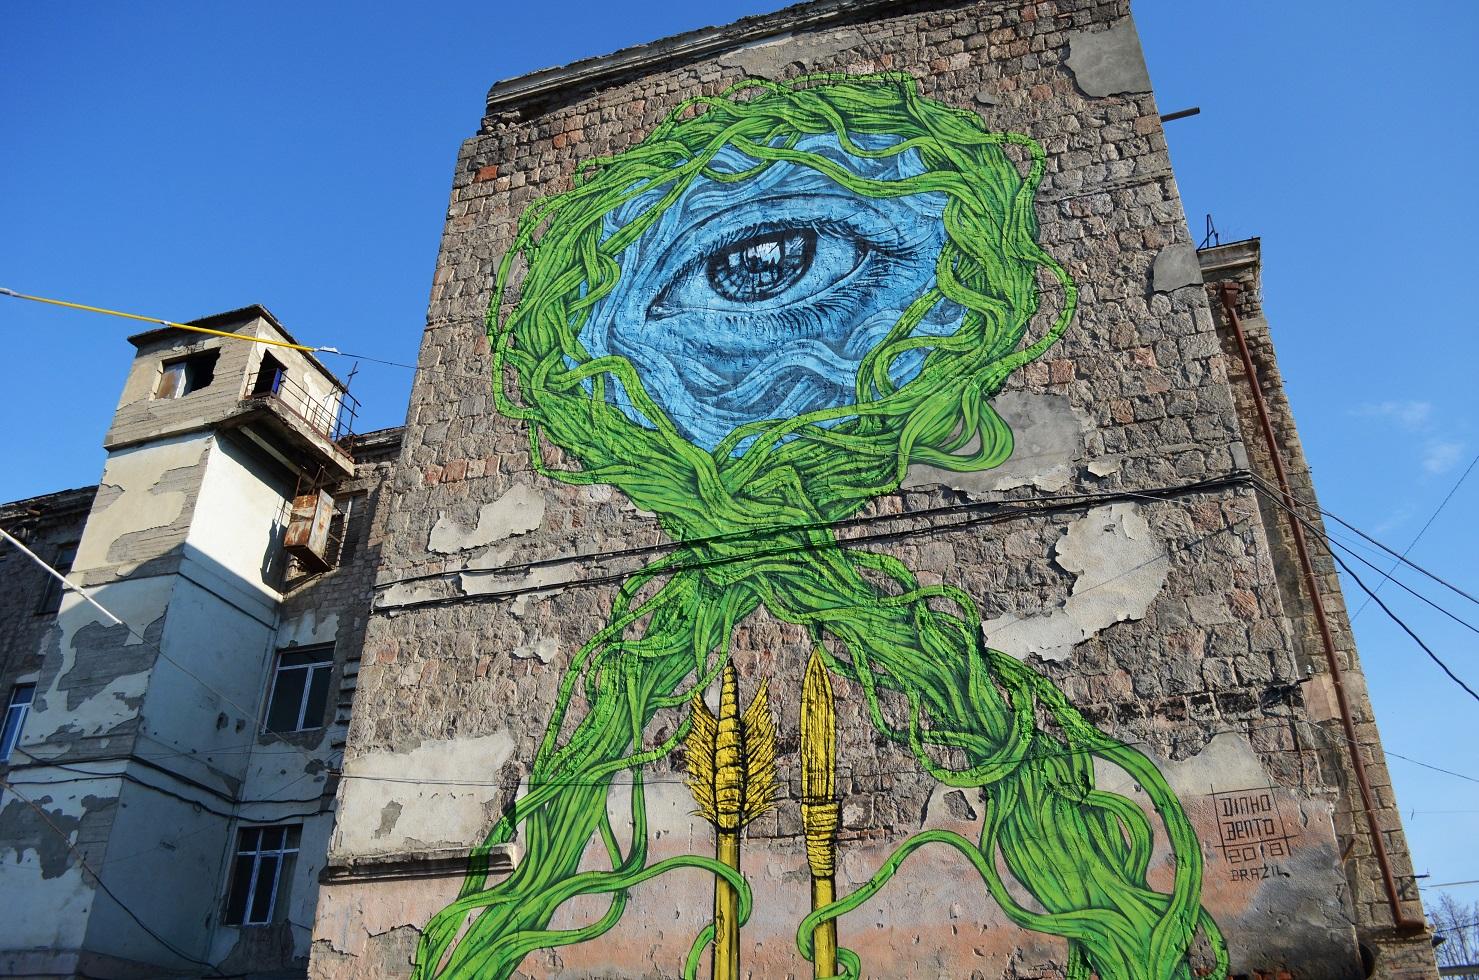 1 1 #art featured, арт, Бразилия, германия, граффити, Грузия, Дино Бенто, искусство, Лапиз, мурал, Саша Корбан, стрит-арт, тбилиси, украина